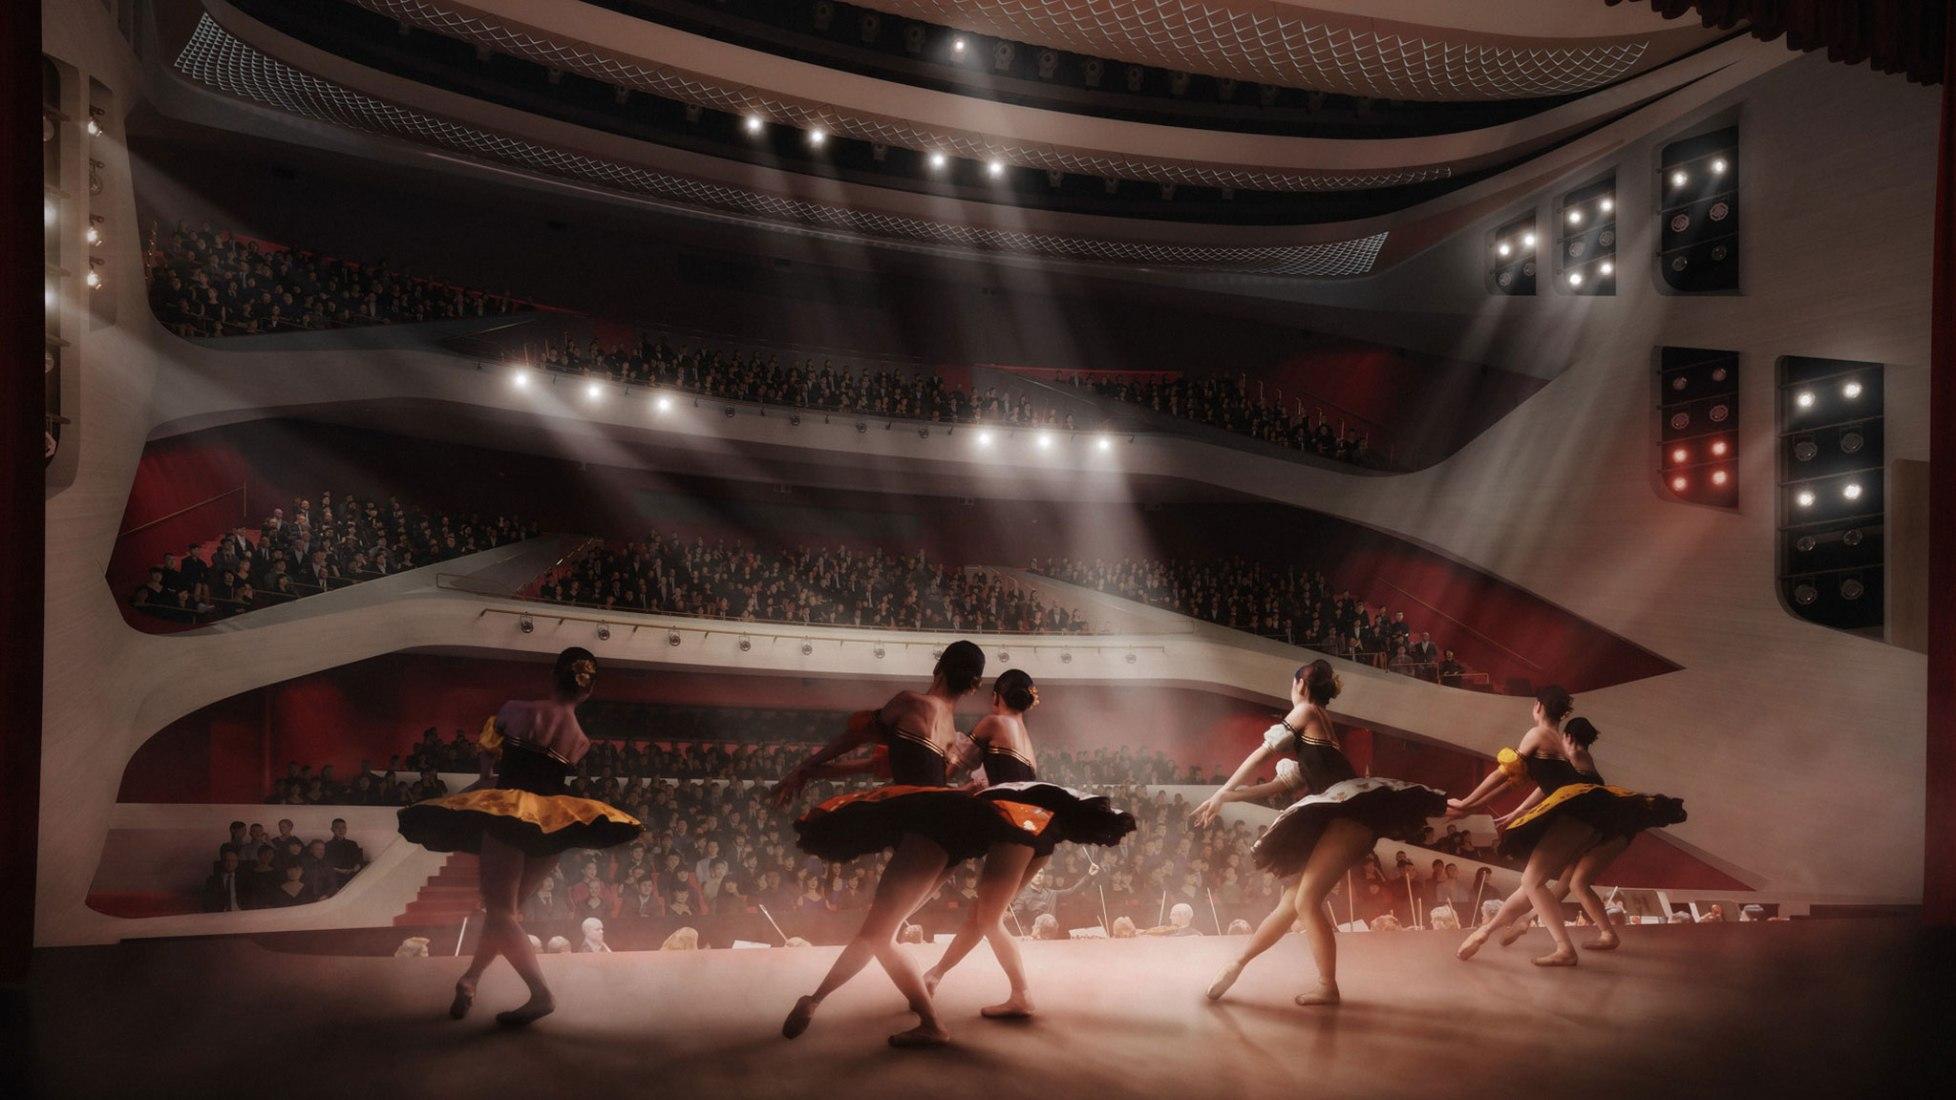 It facing the auditorium. Lyric Theatre Complex by UNStudio. Image by DBOX / UNStudio